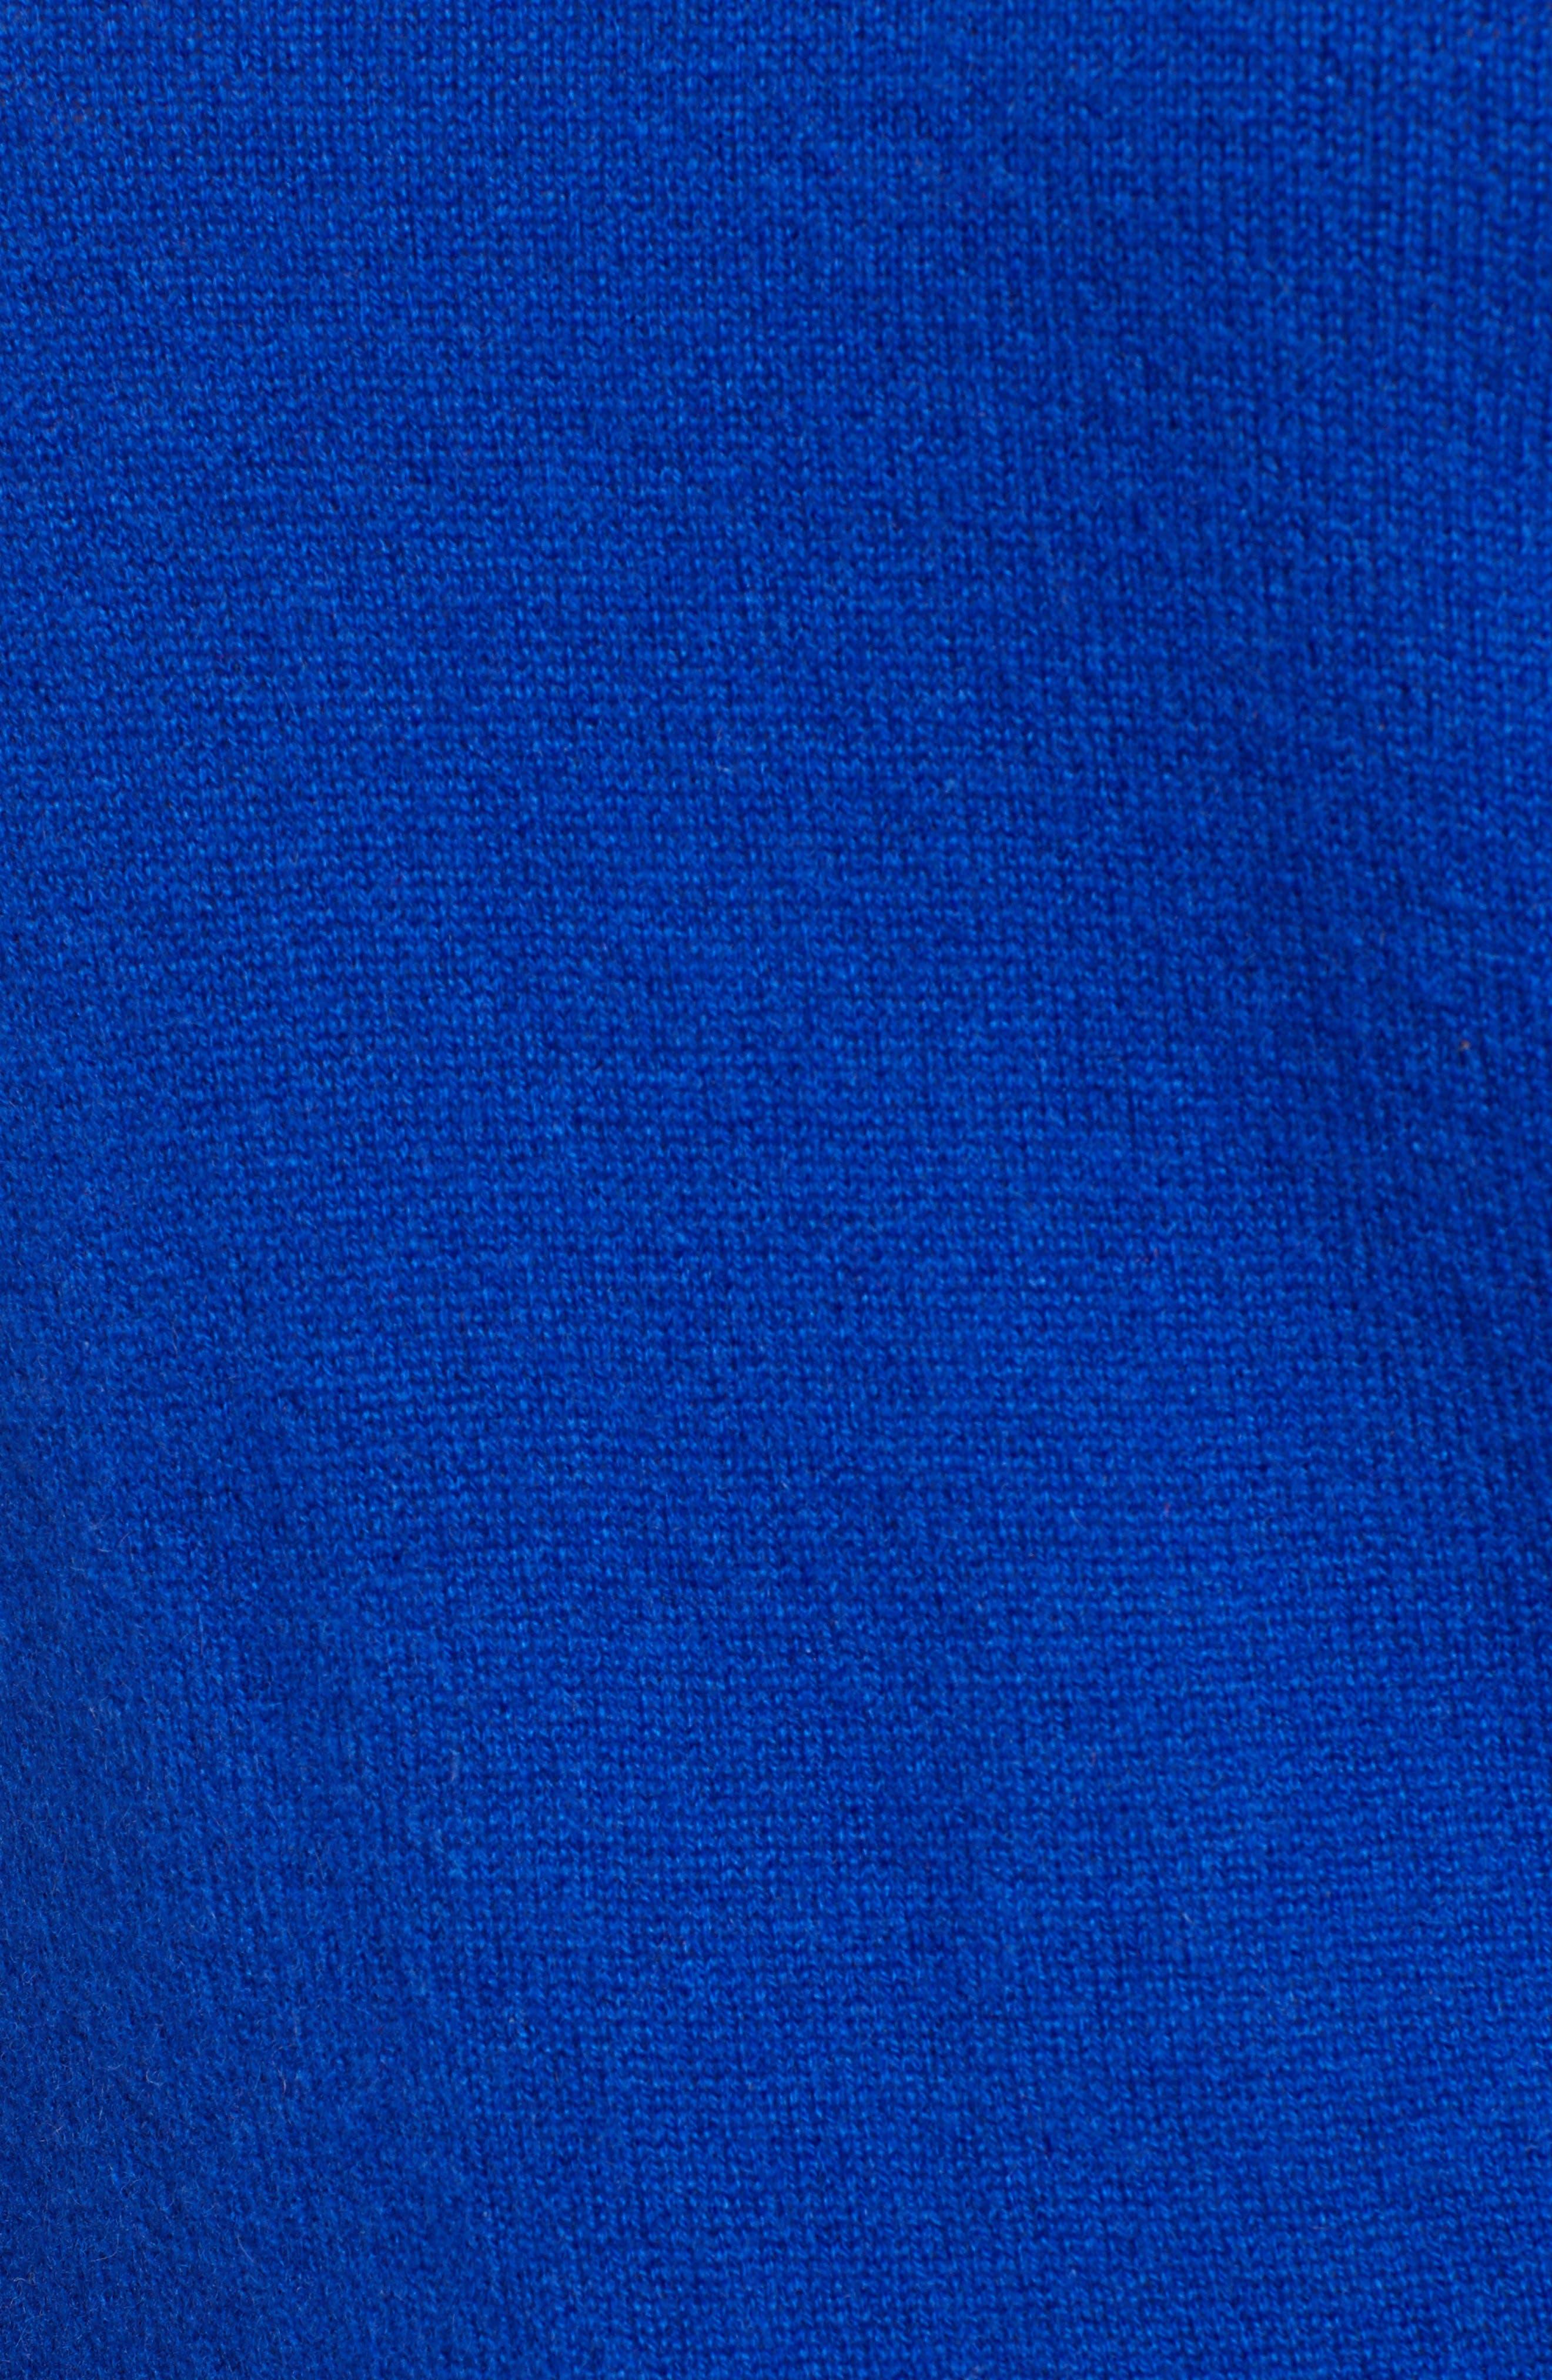 Crewneck Cashmere Sweater,                             Alternate thumbnail 5, color,                             BLUE MAZARINE